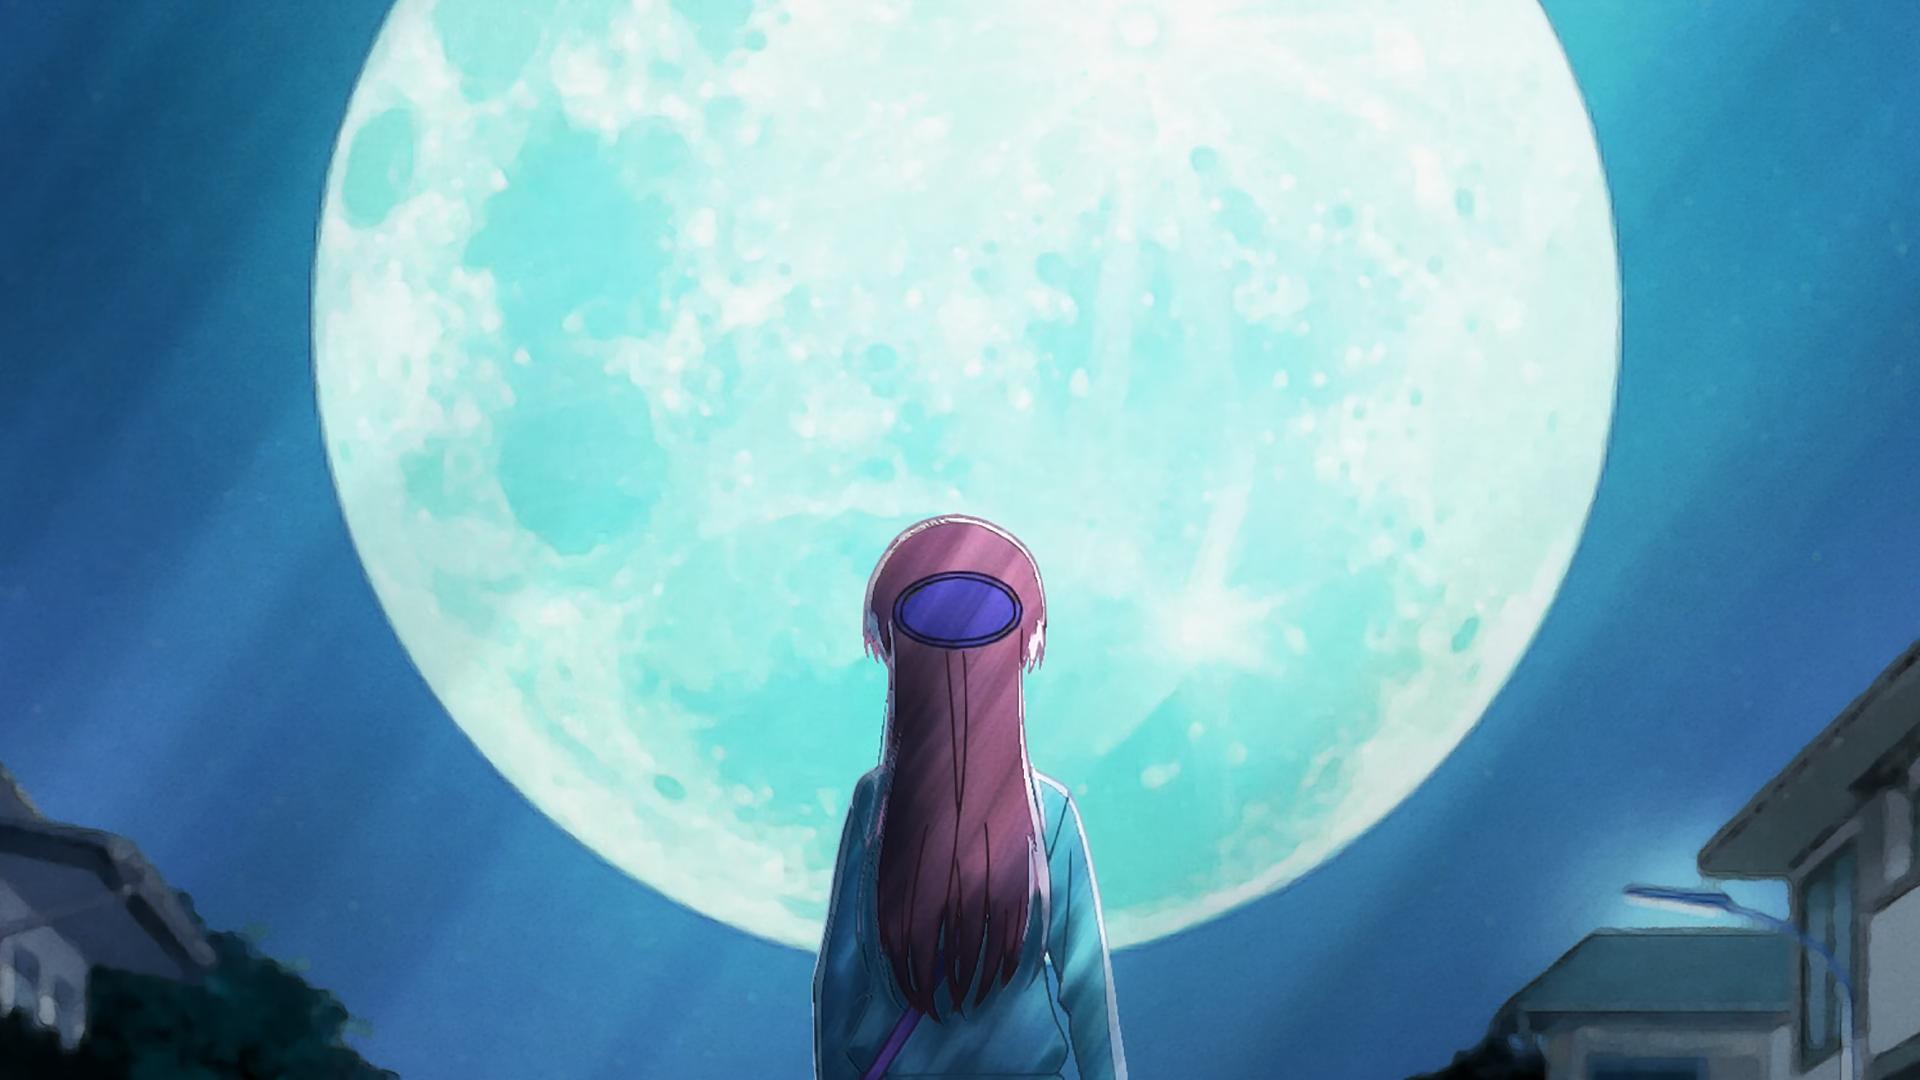 Tsukasa se encamina hacia la luna, TONIKAWA